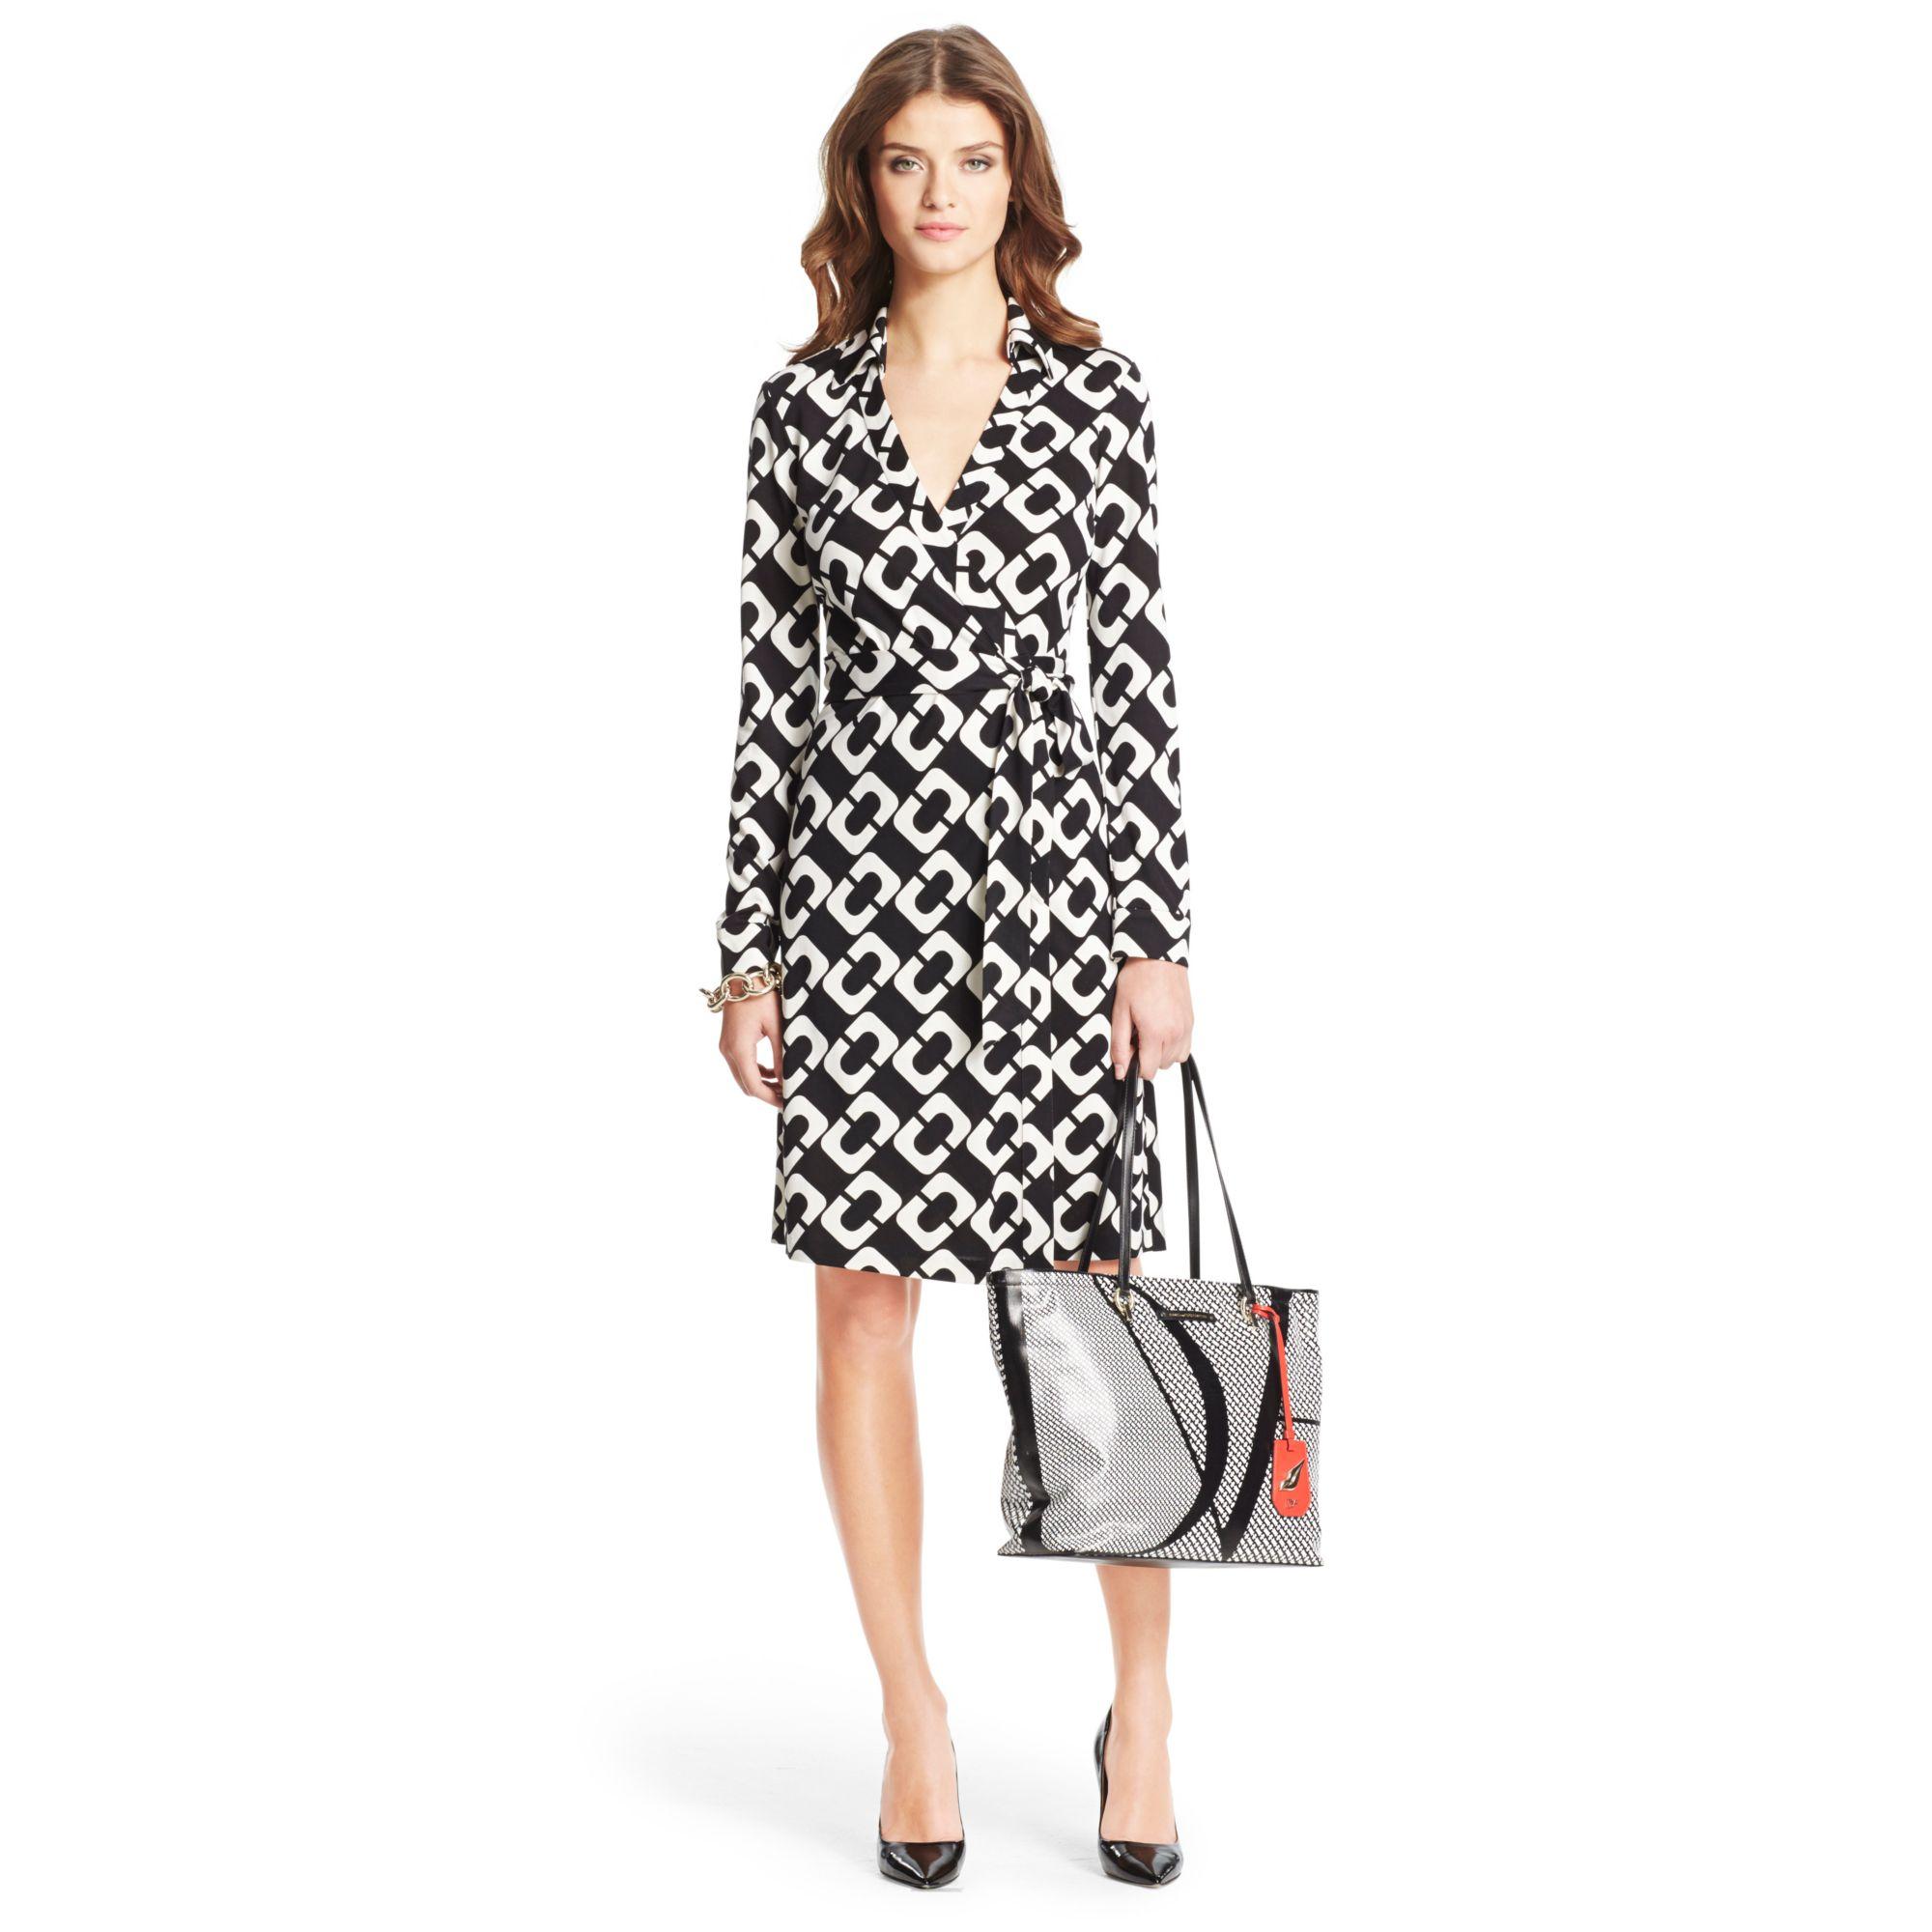 Genuine Dvf Diane Von Furstenberg jersey wrap dress From China For Sale Very Cheap Discount Geniue Stockist jFCtcQumW